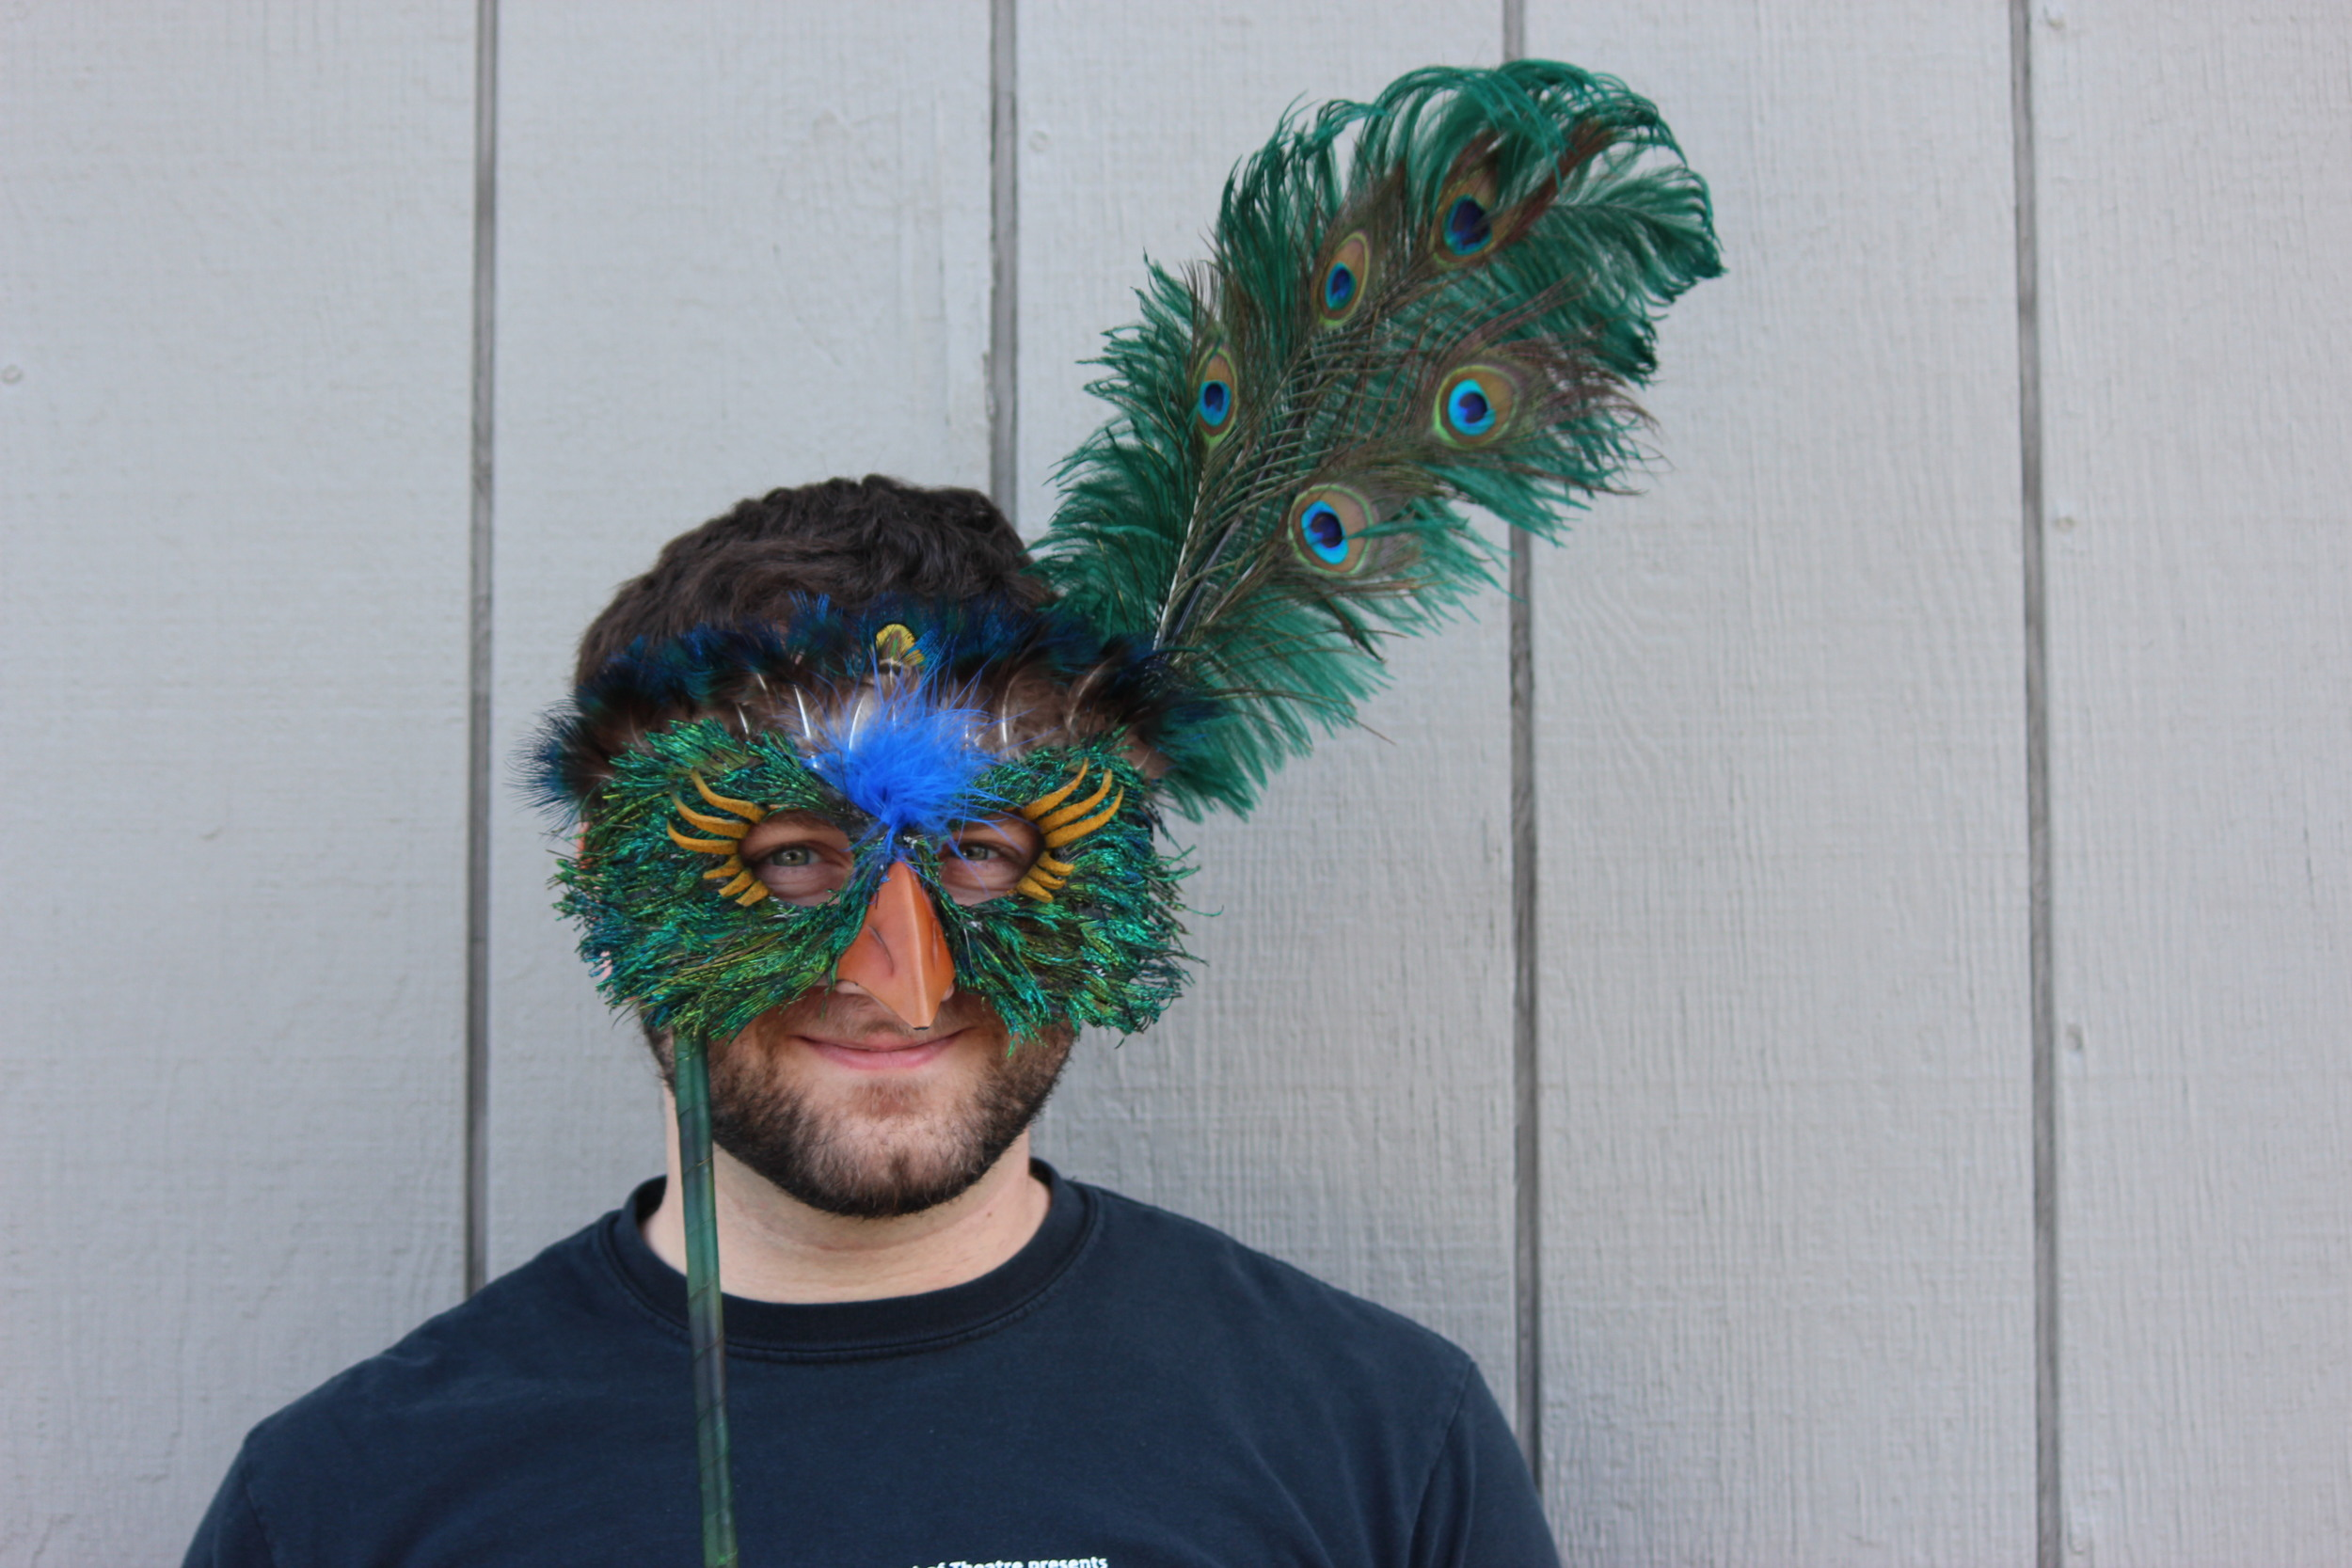 peacockdetail2